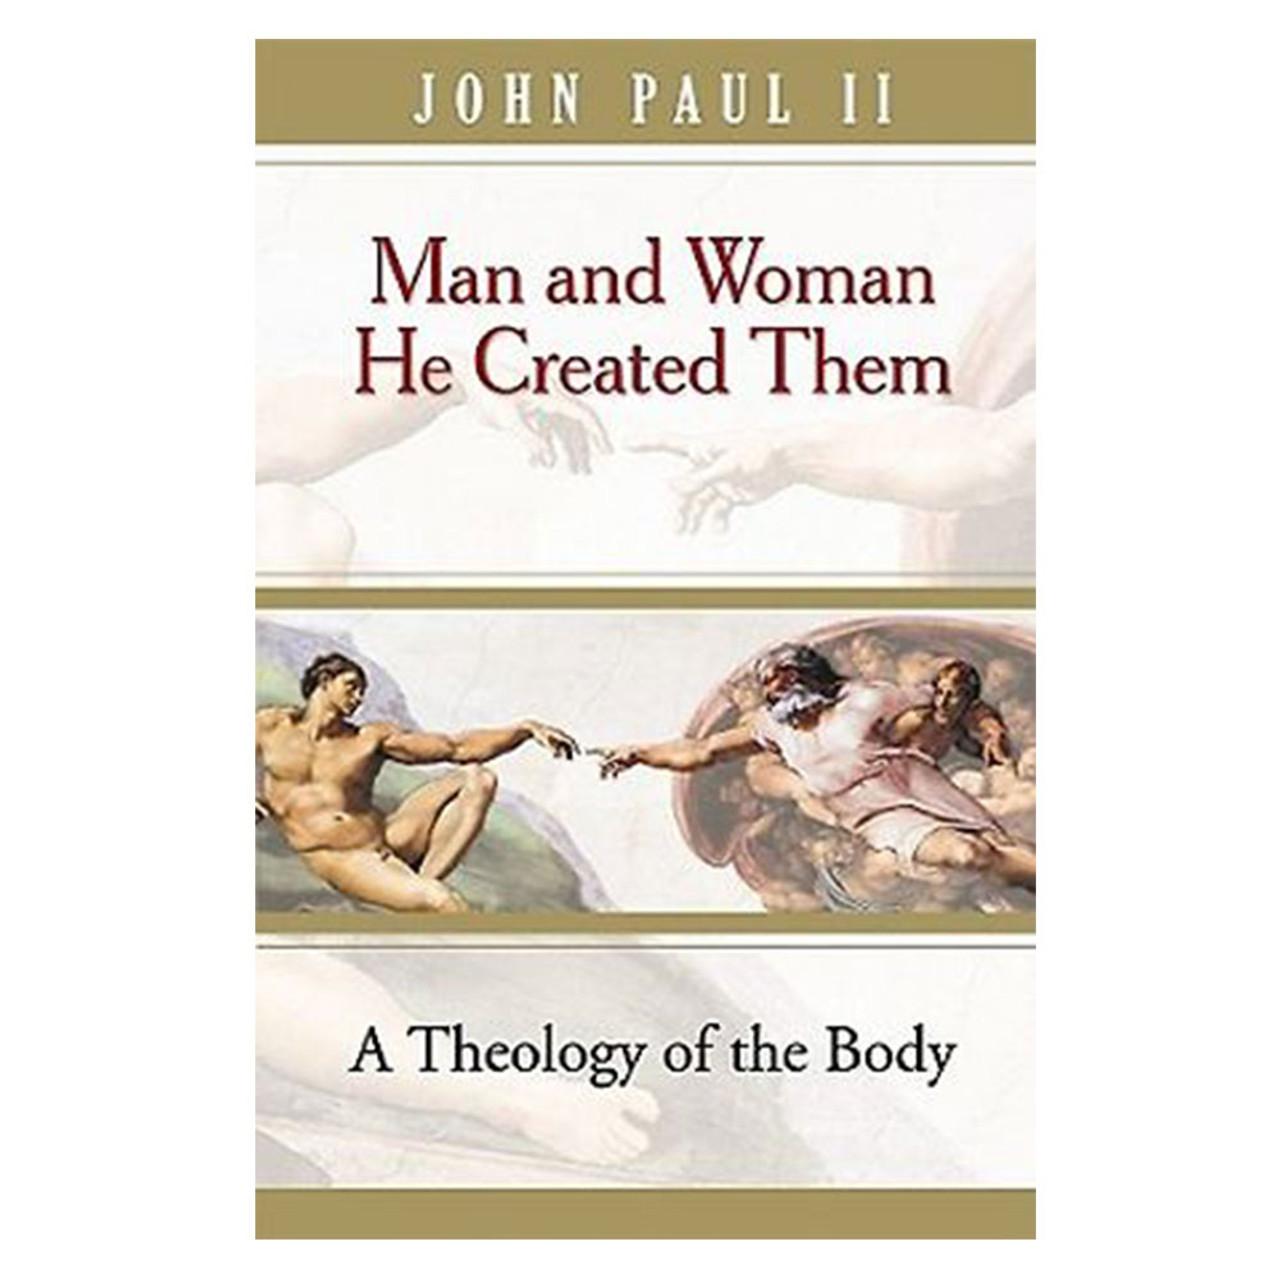 Man and Woman He Created Them Pope John Paul II